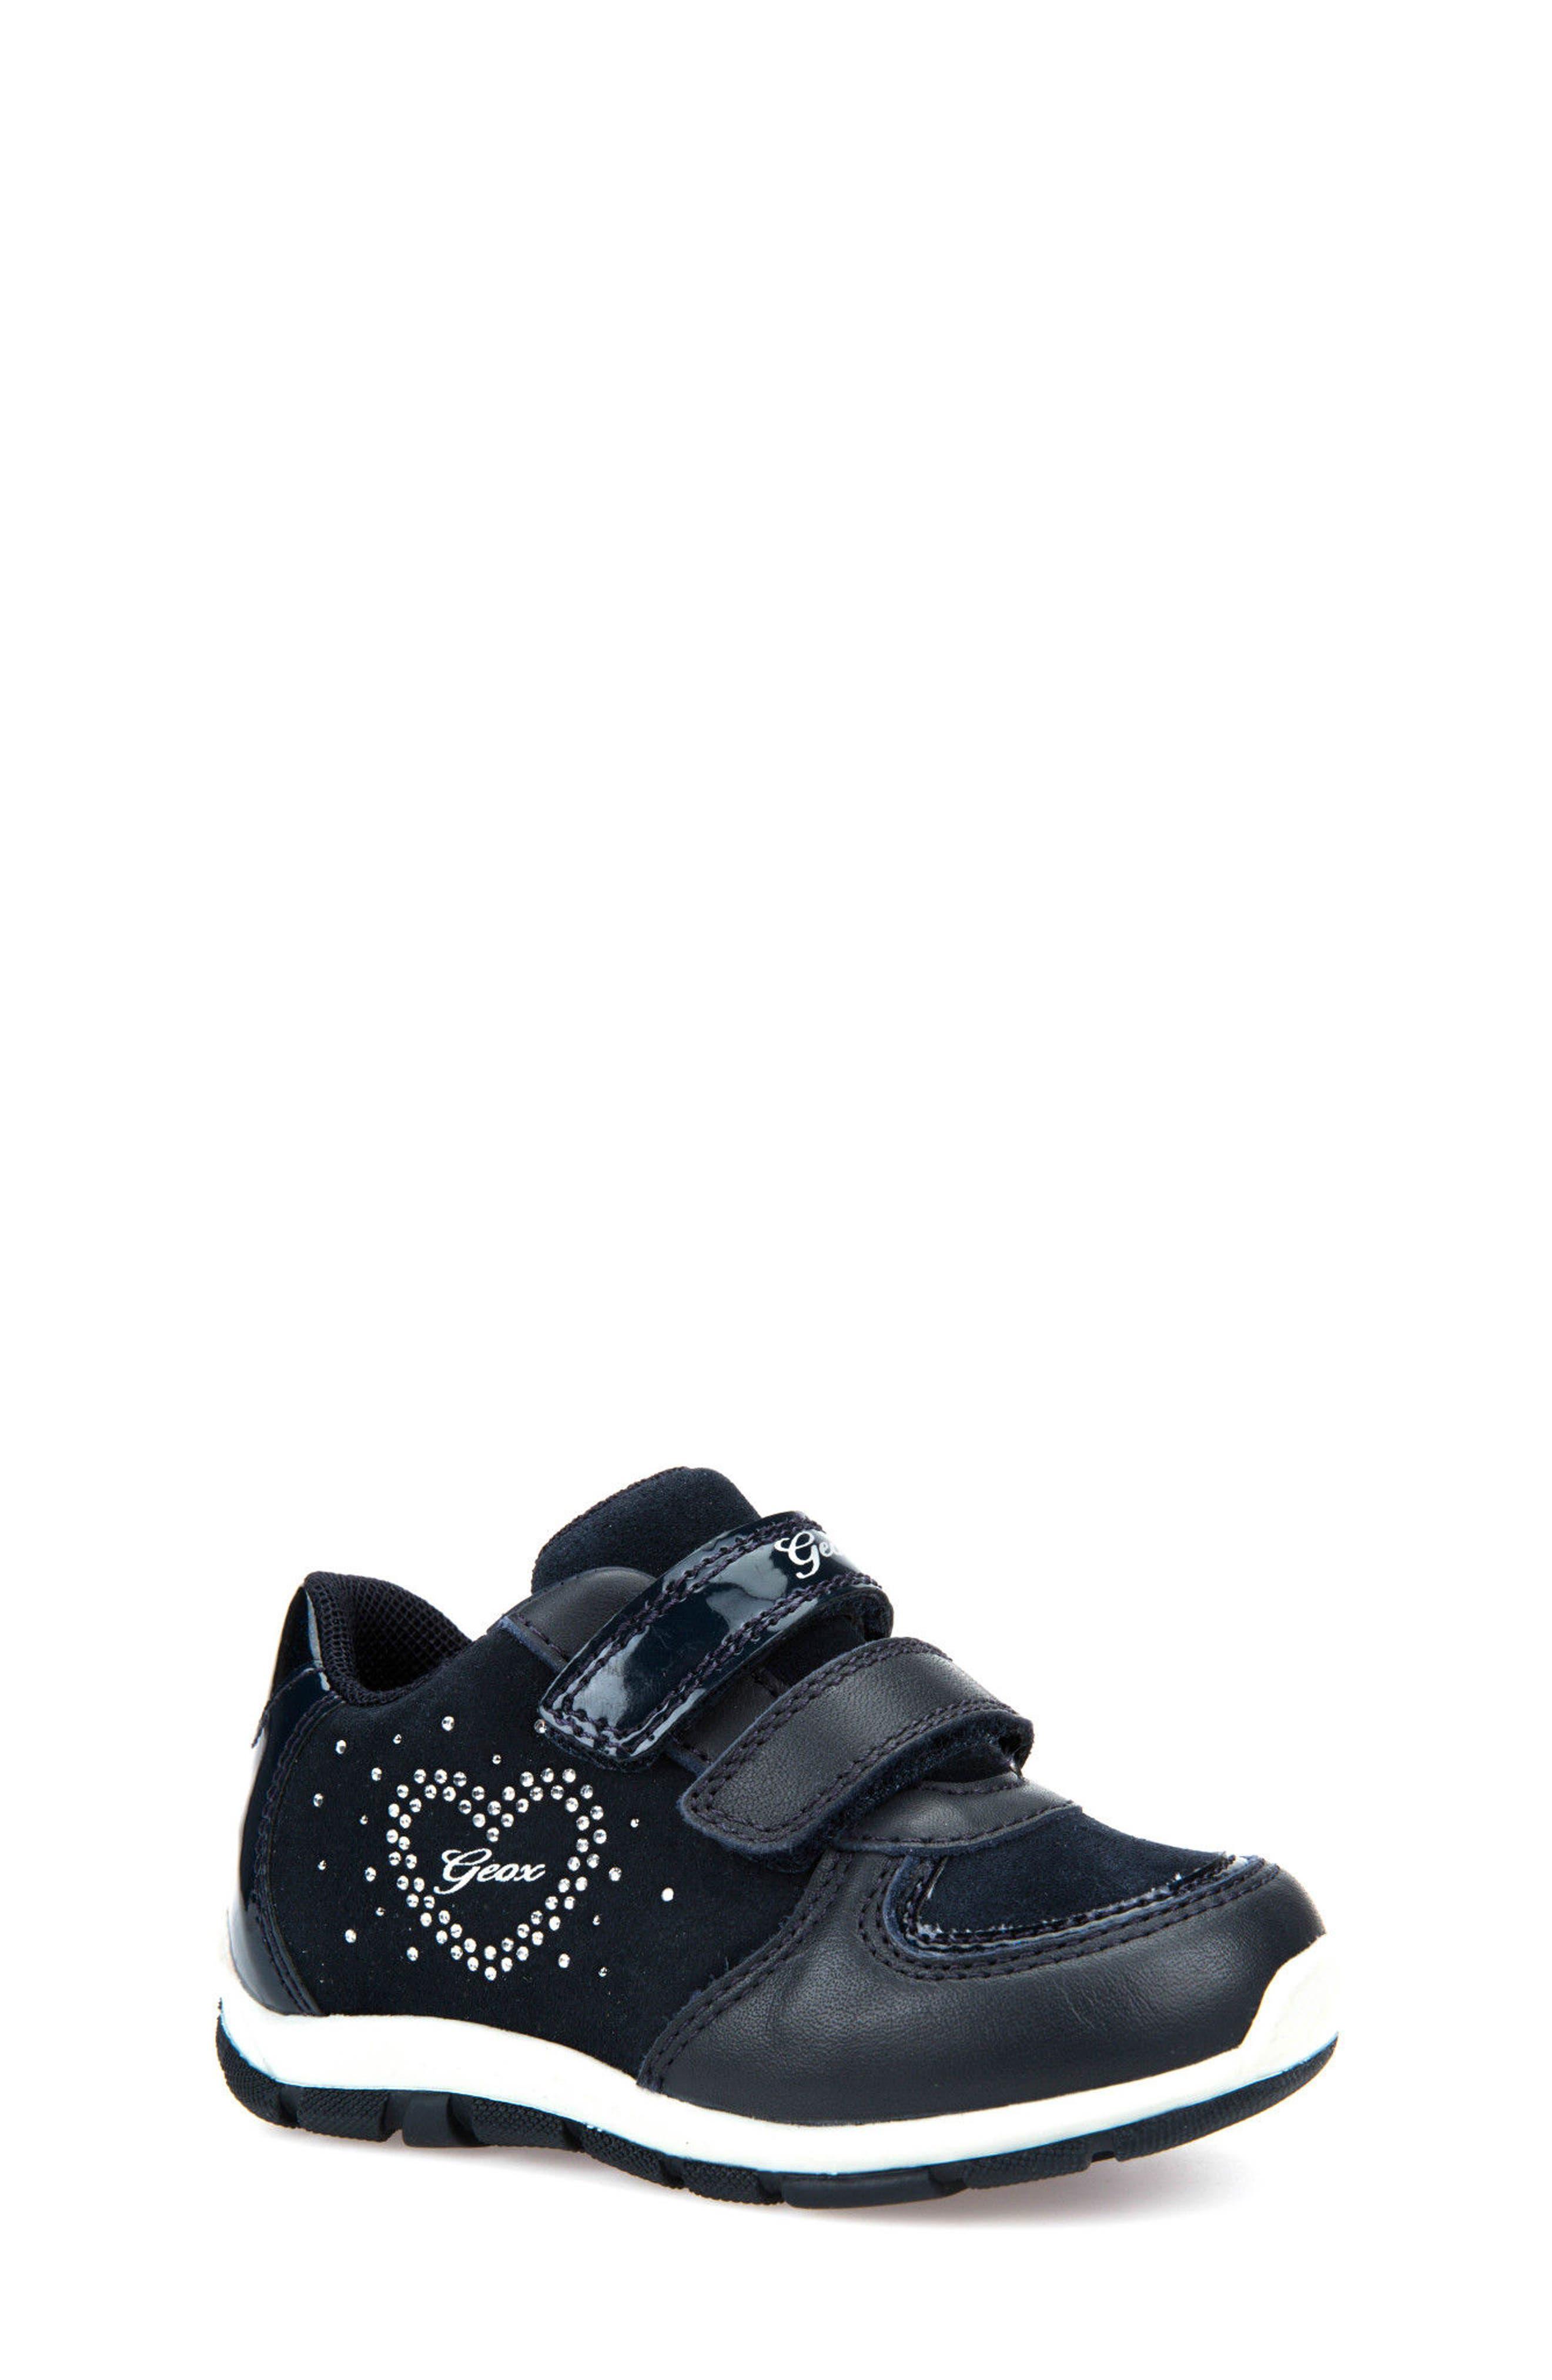 Shaax Love Sneaker,                             Main thumbnail 1, color,                             410